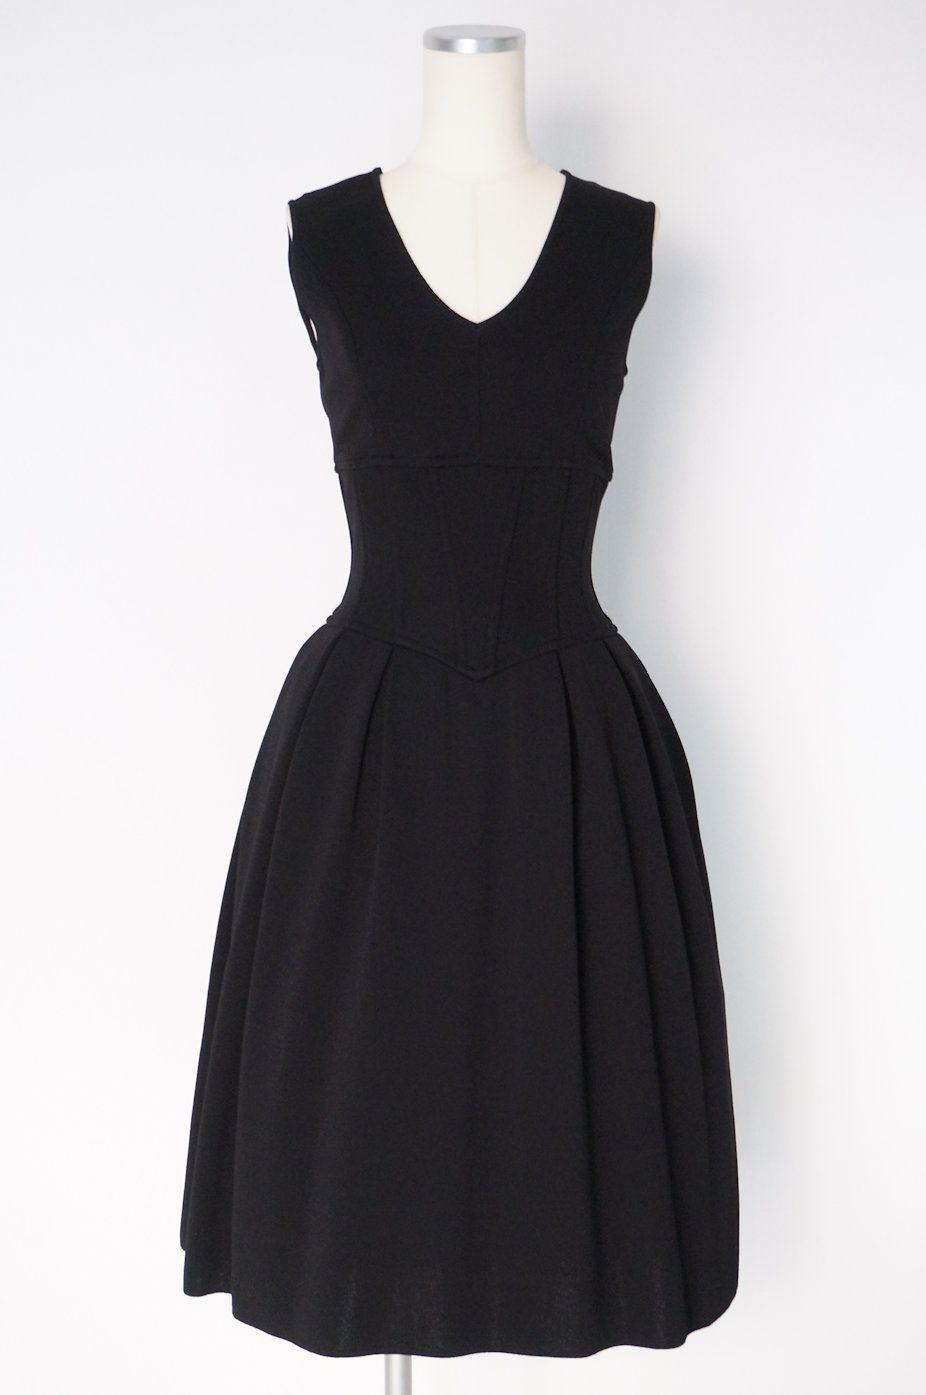 de4e610fc6cff フォクシー マジックフレアードレス 38   レンタルリトルブラックドレス テン Rental Little Black Dress ten.